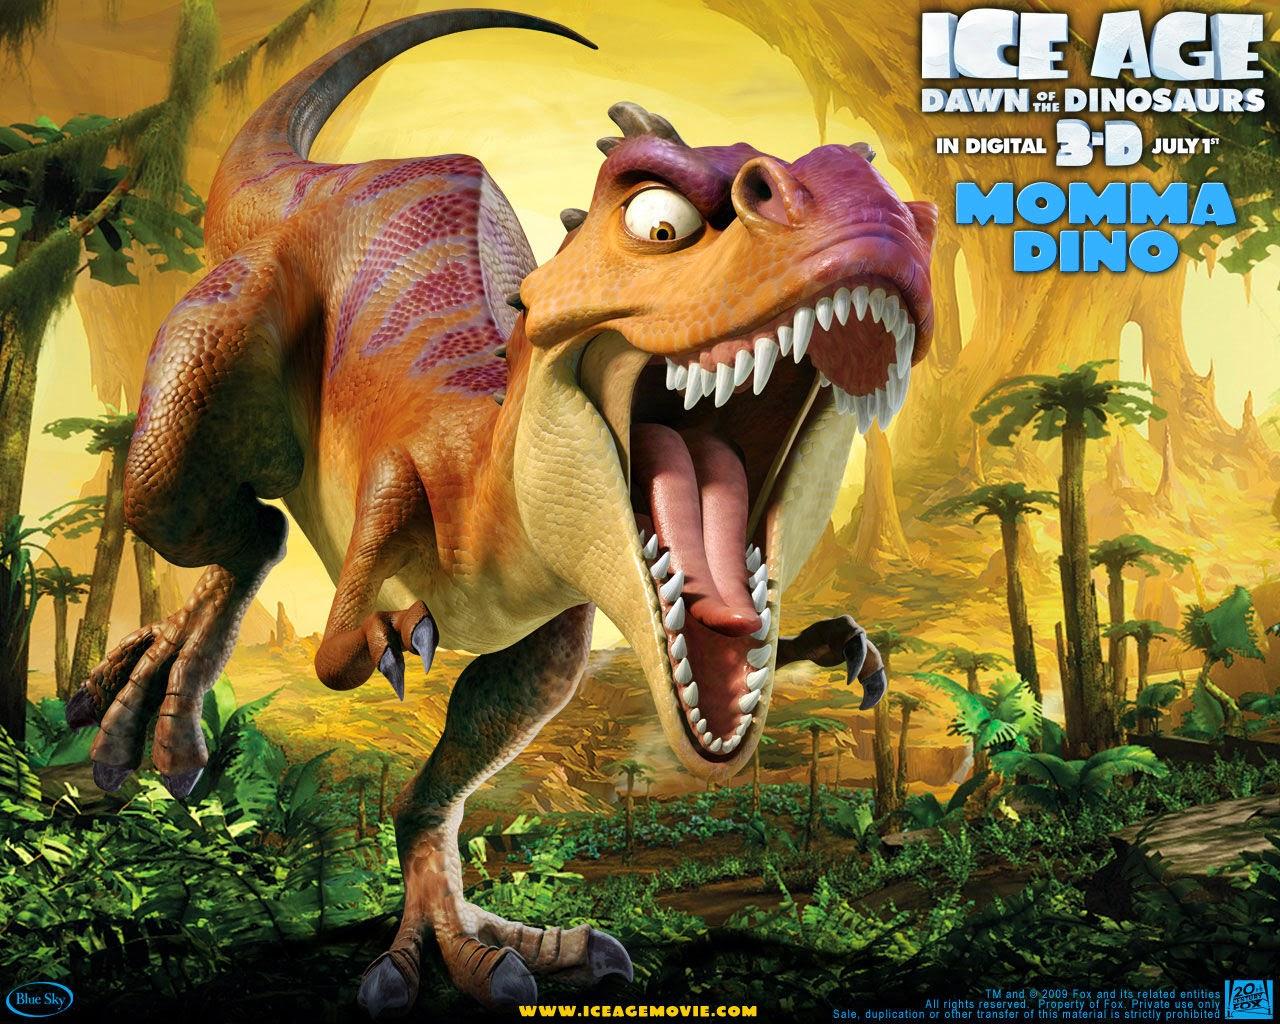 Ice Age Dawn of the Dinosaurs animatefilmreviews.filminspector.com